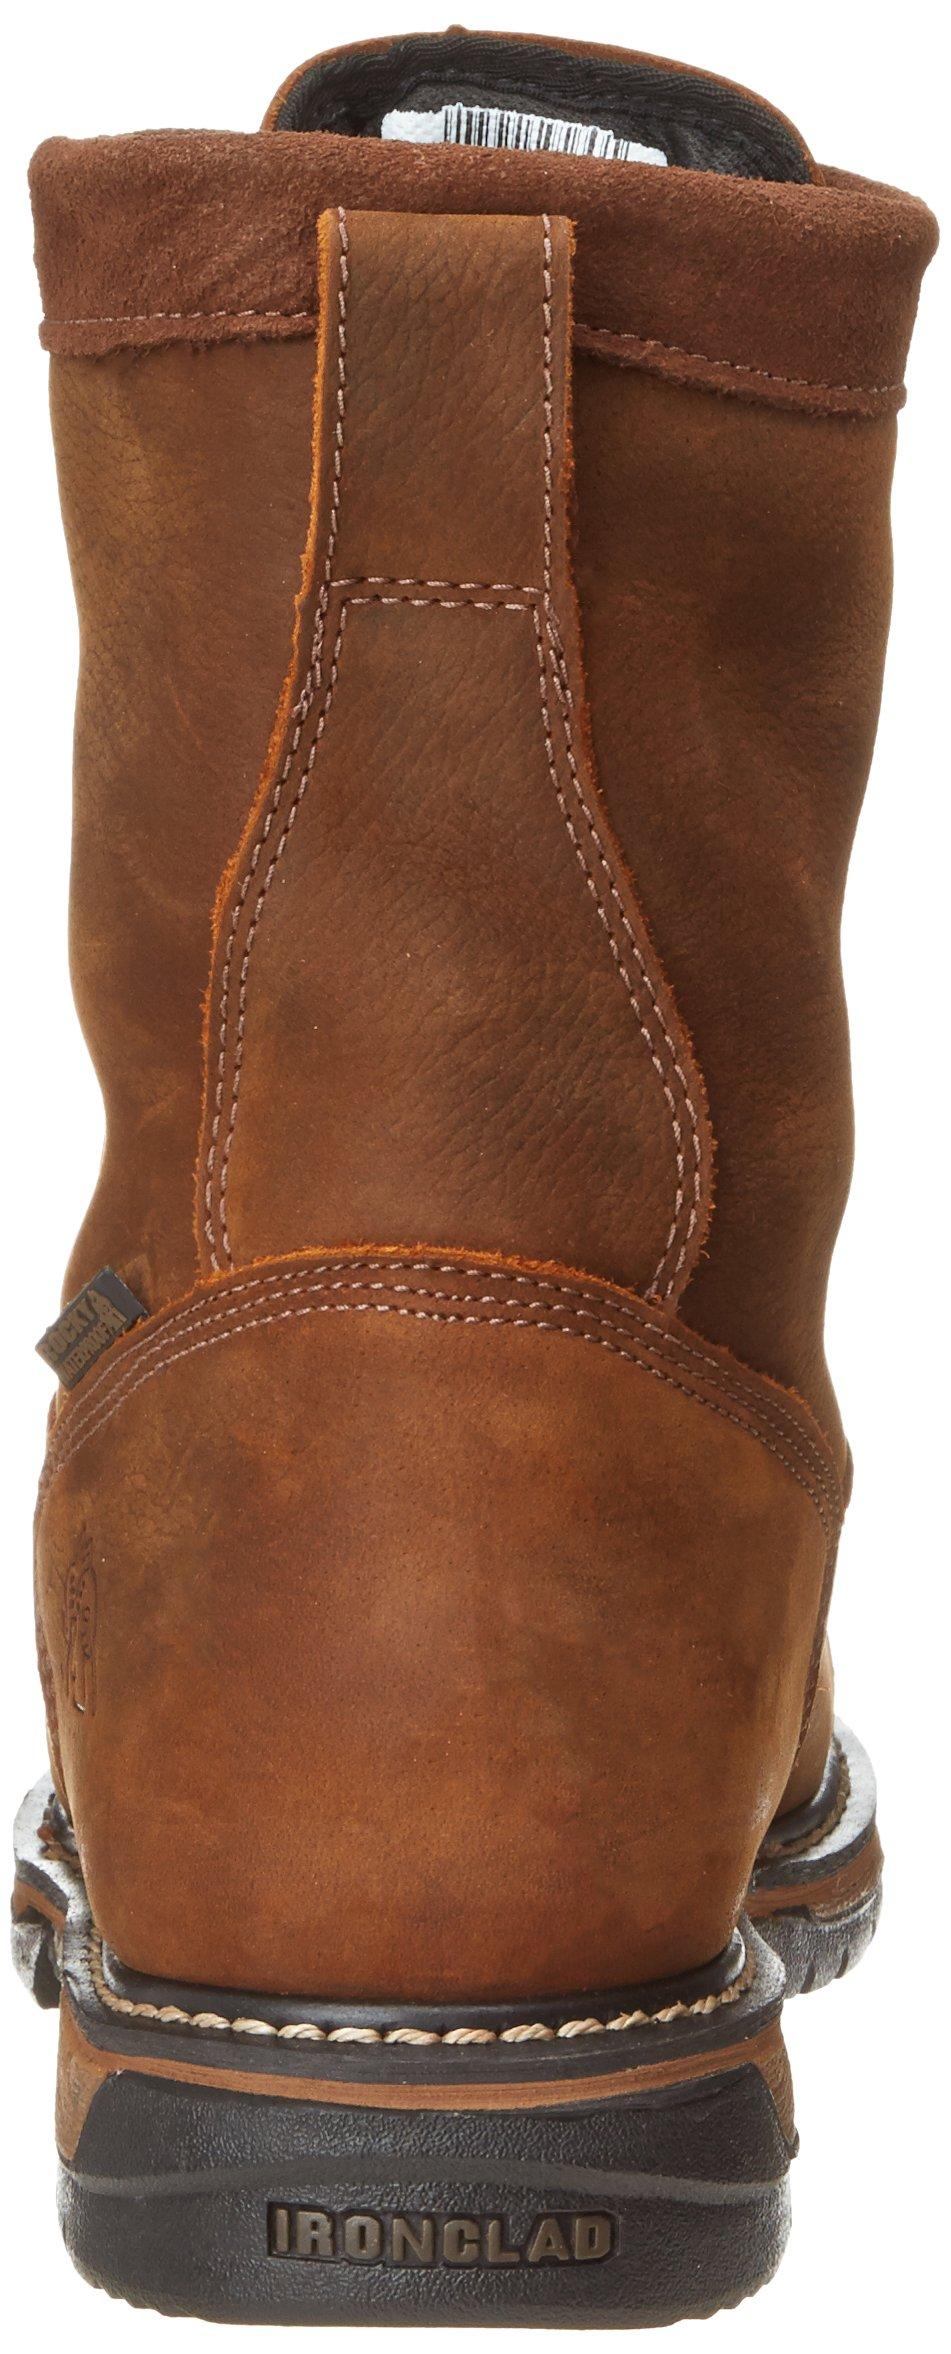 Rocky Men's Iron Clad Eight Inch LTT Steel Toe Work Boot,Brown,13 M US by Rocky (Image #2)